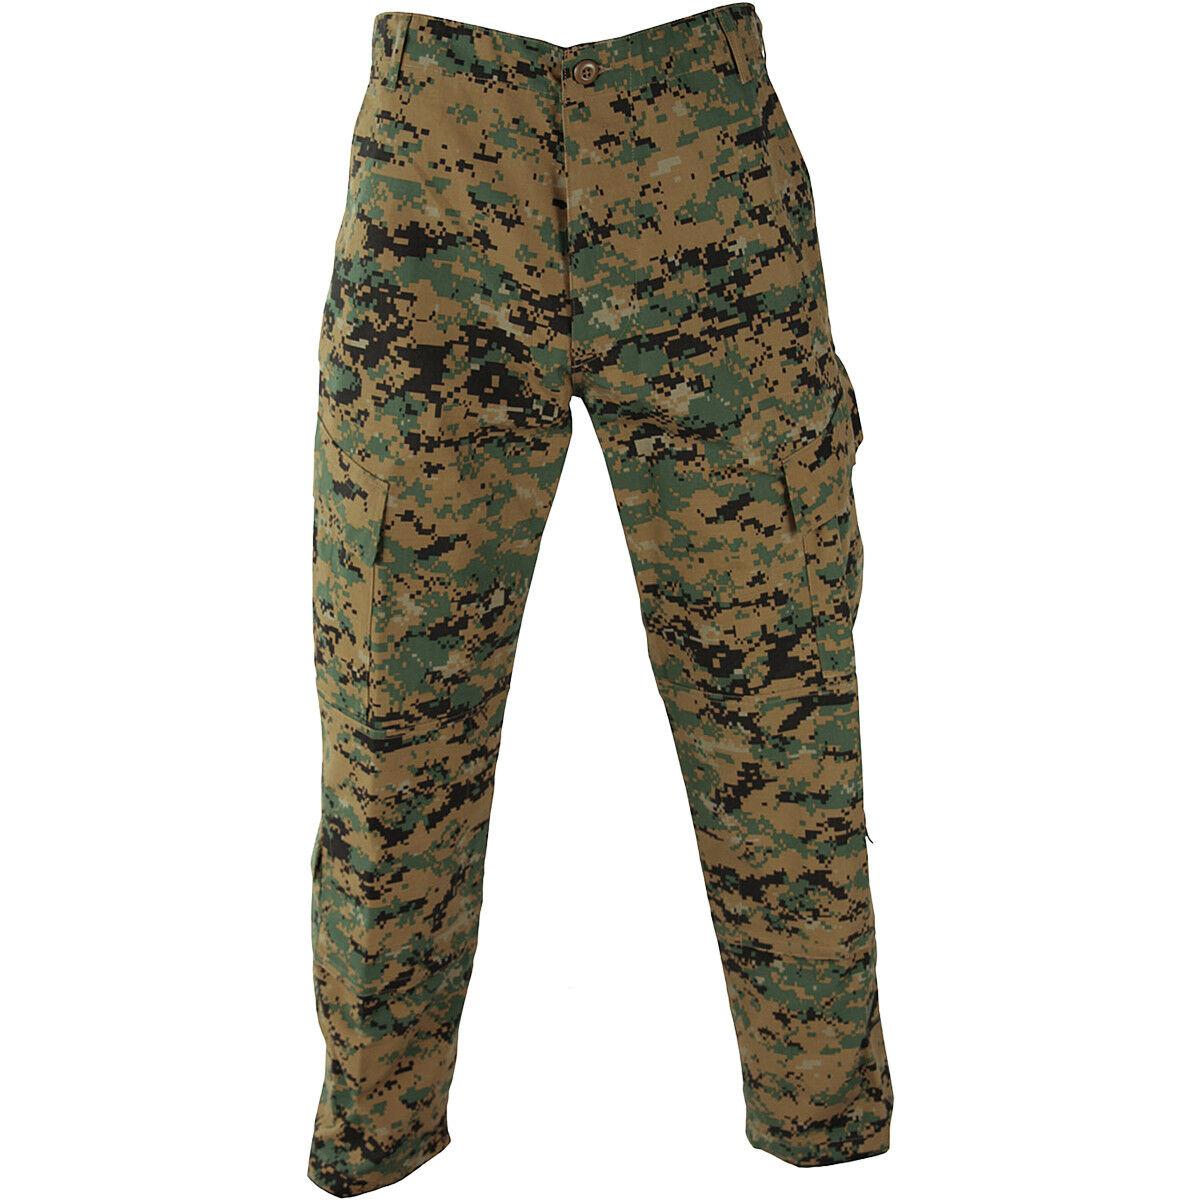 Propper ACU Trousers Mens Polycotton Ripstop Uniform Cargo Digital Woodland Camo